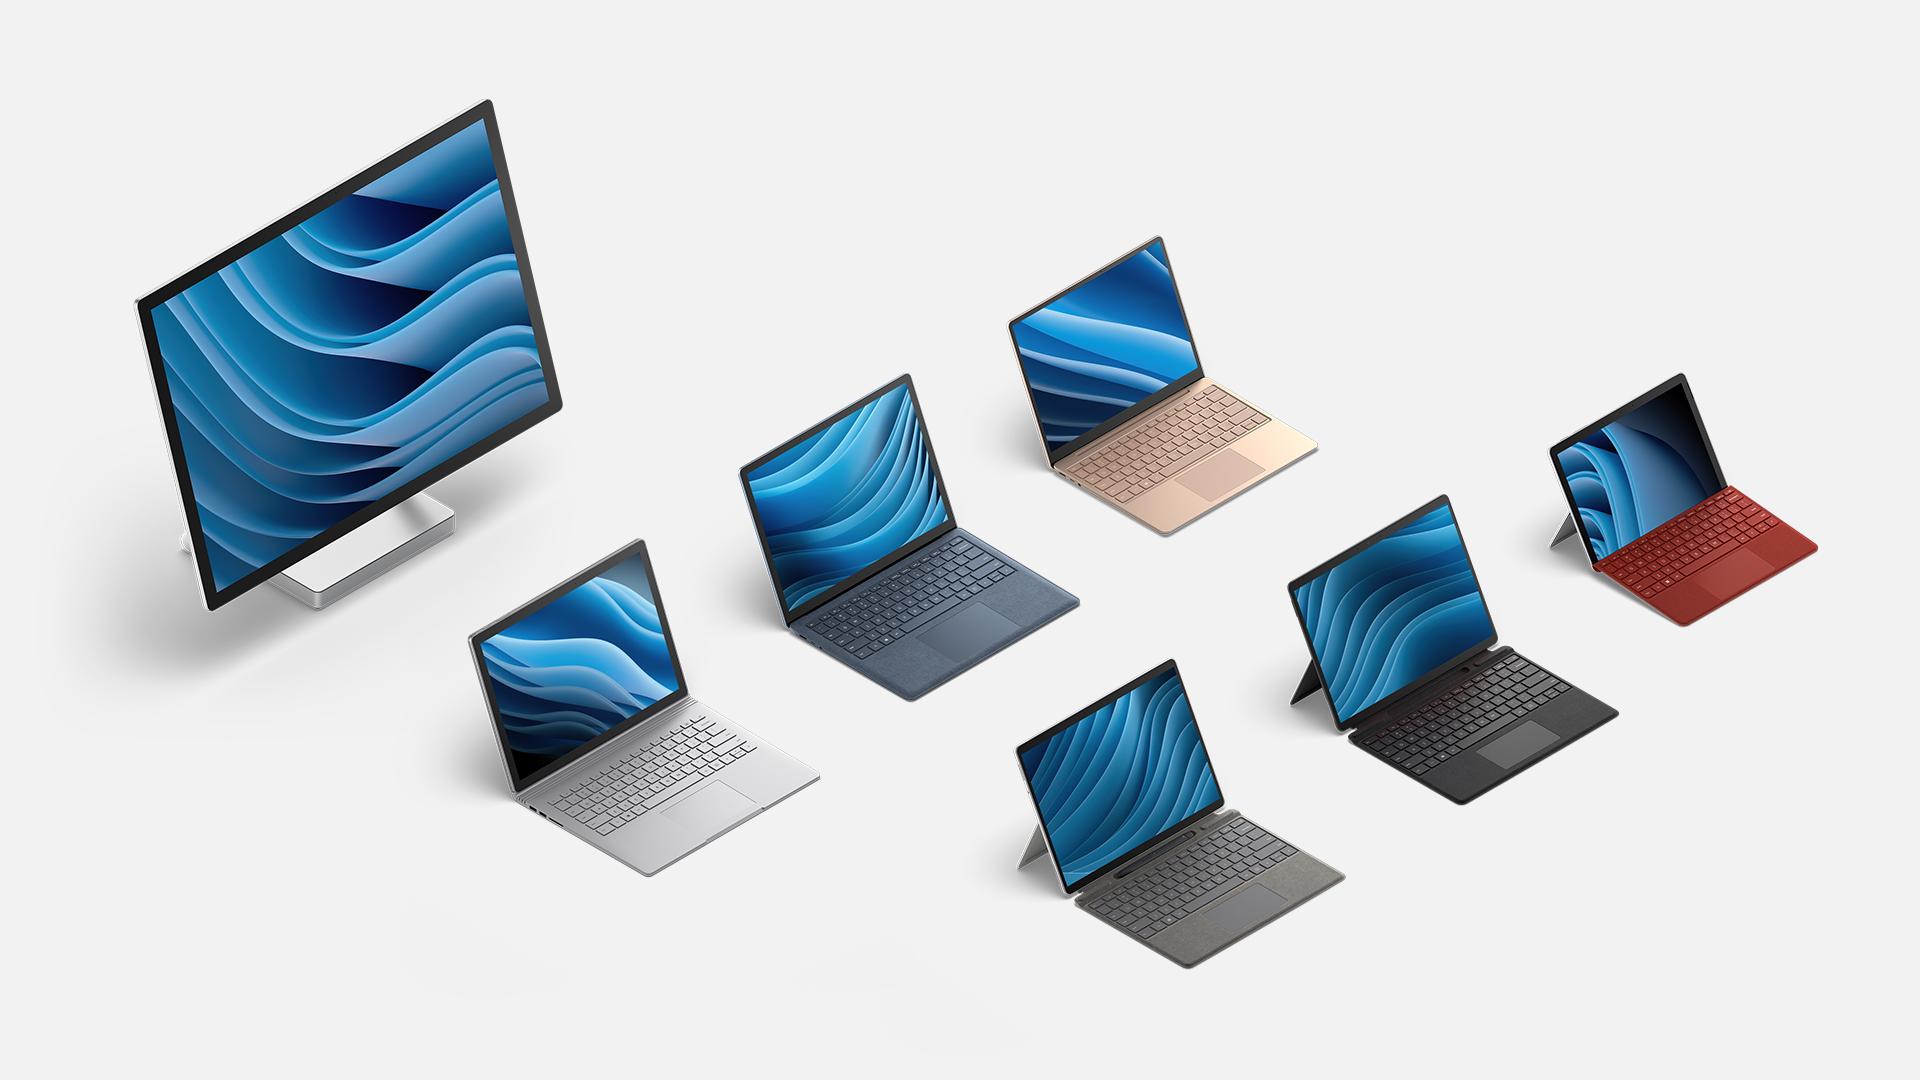 Surface 全系列裝置。